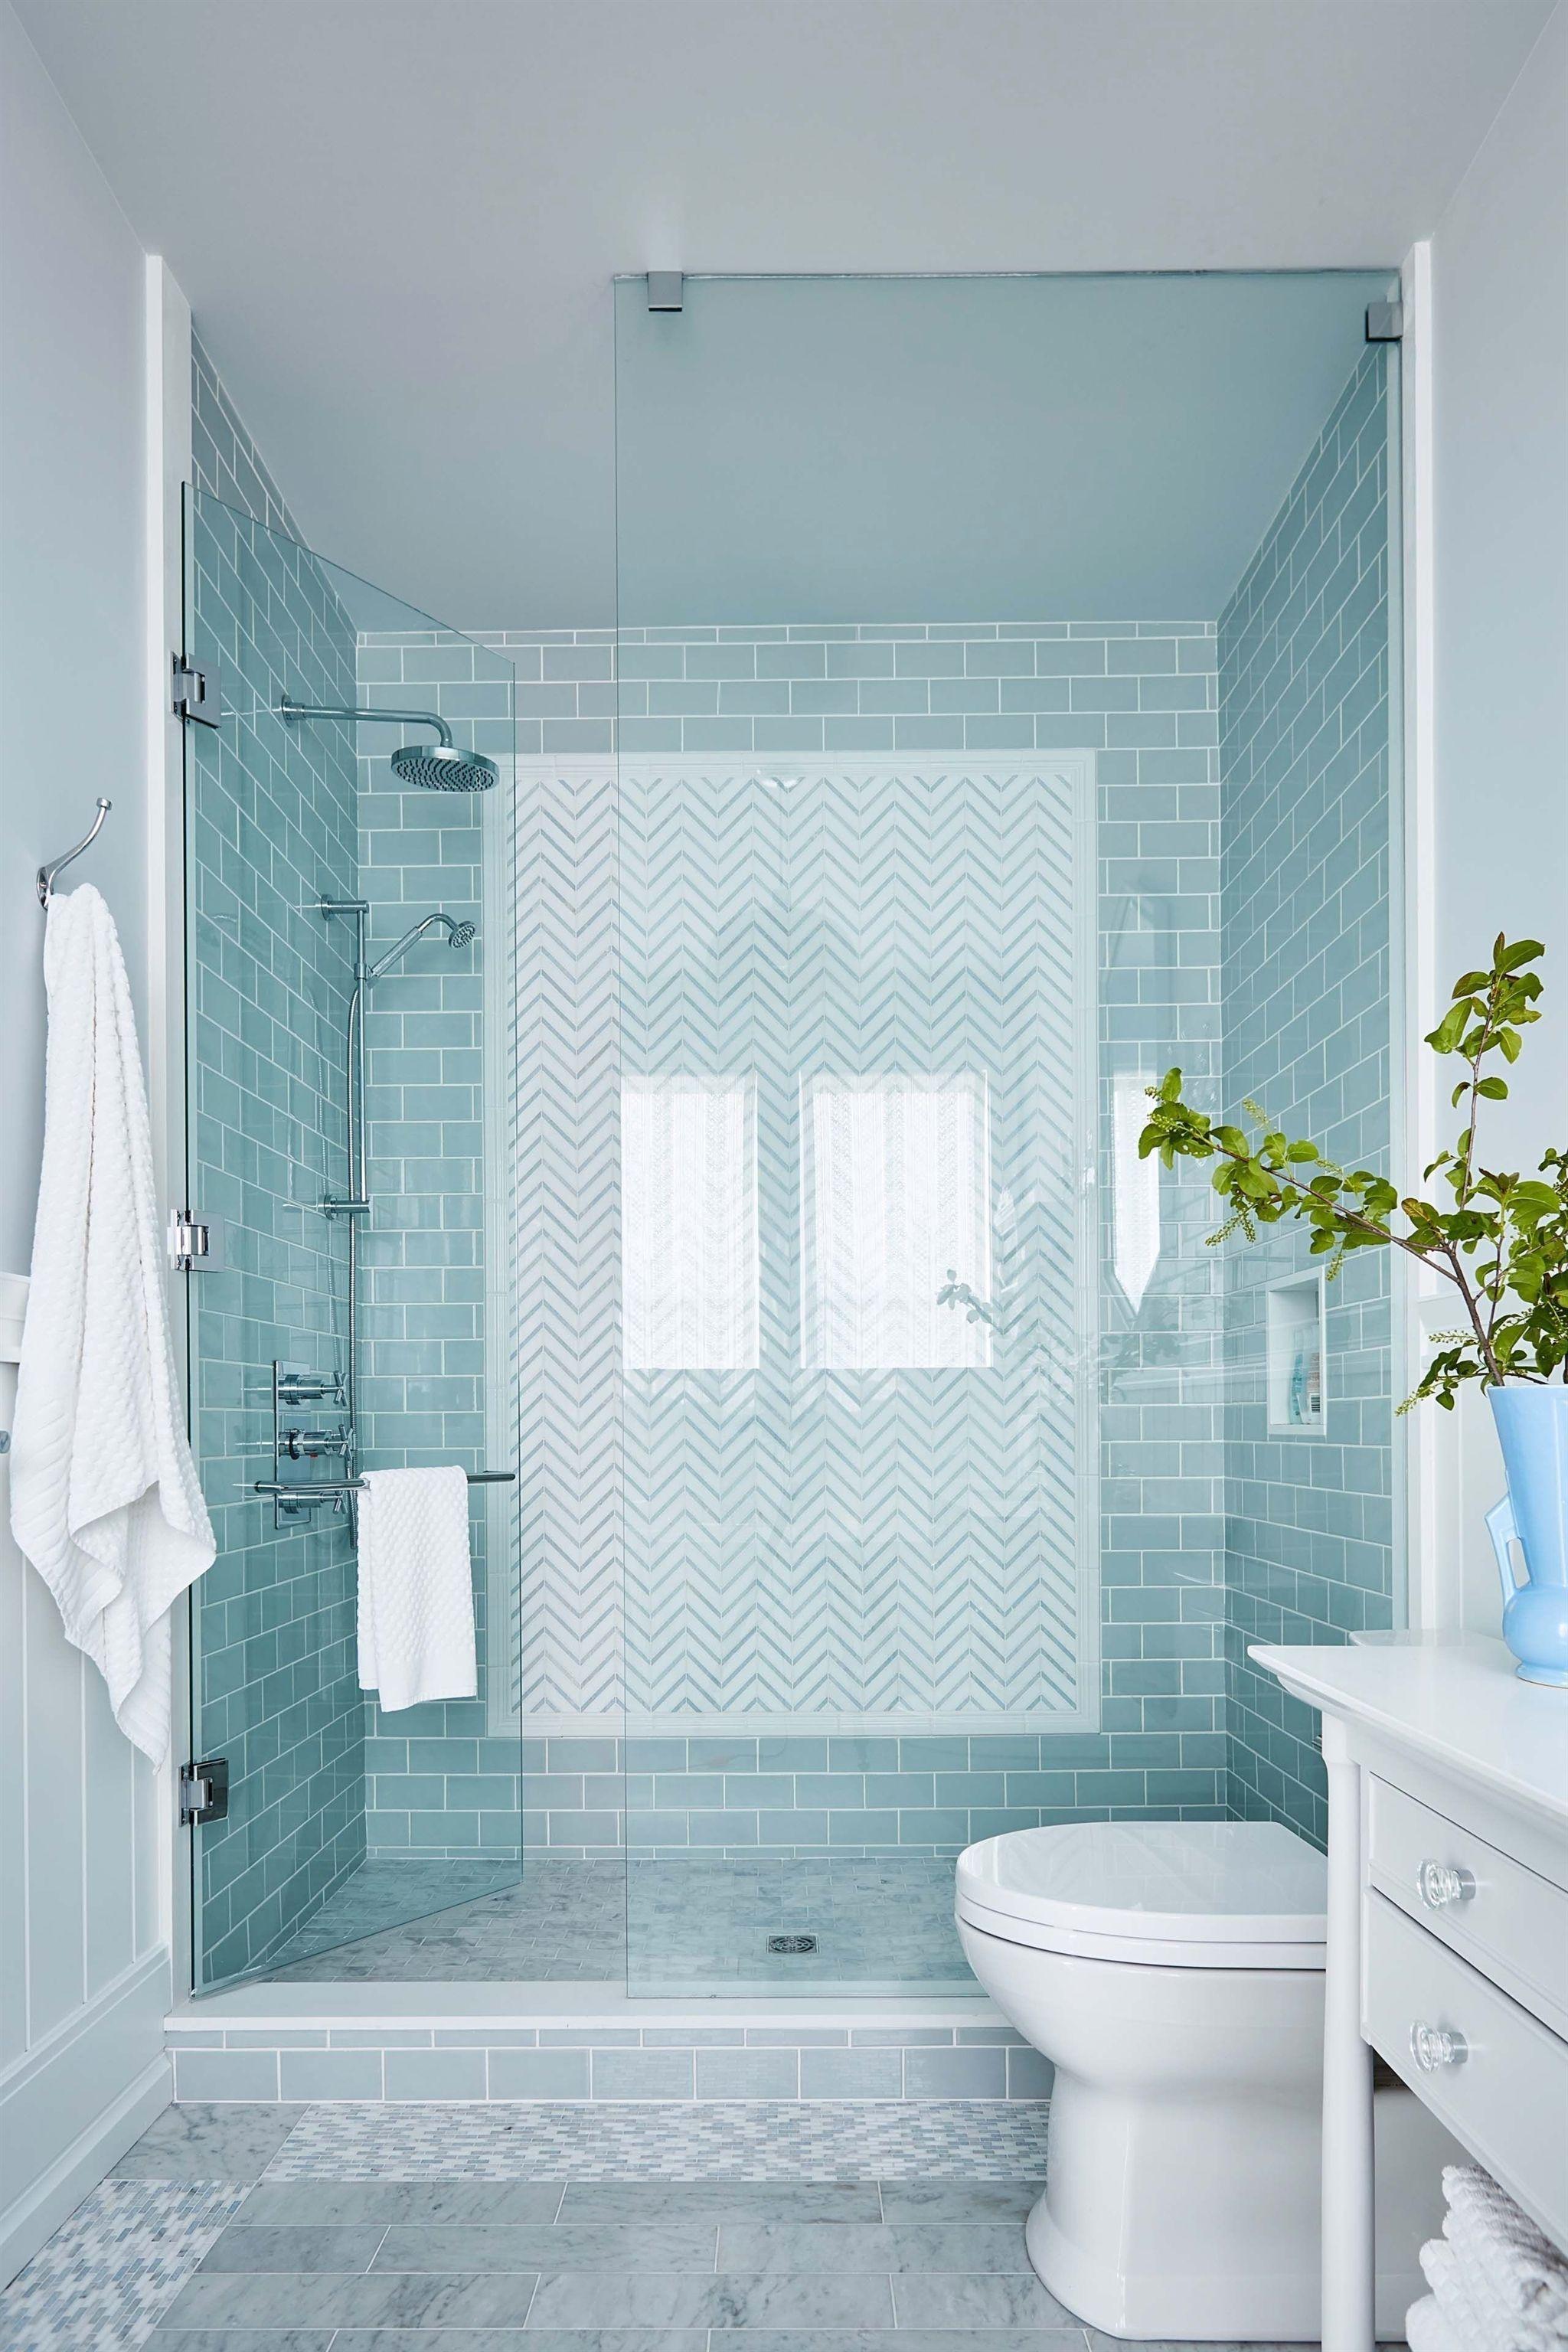 How to unclog a toilet?   Simple bathroom designs ...